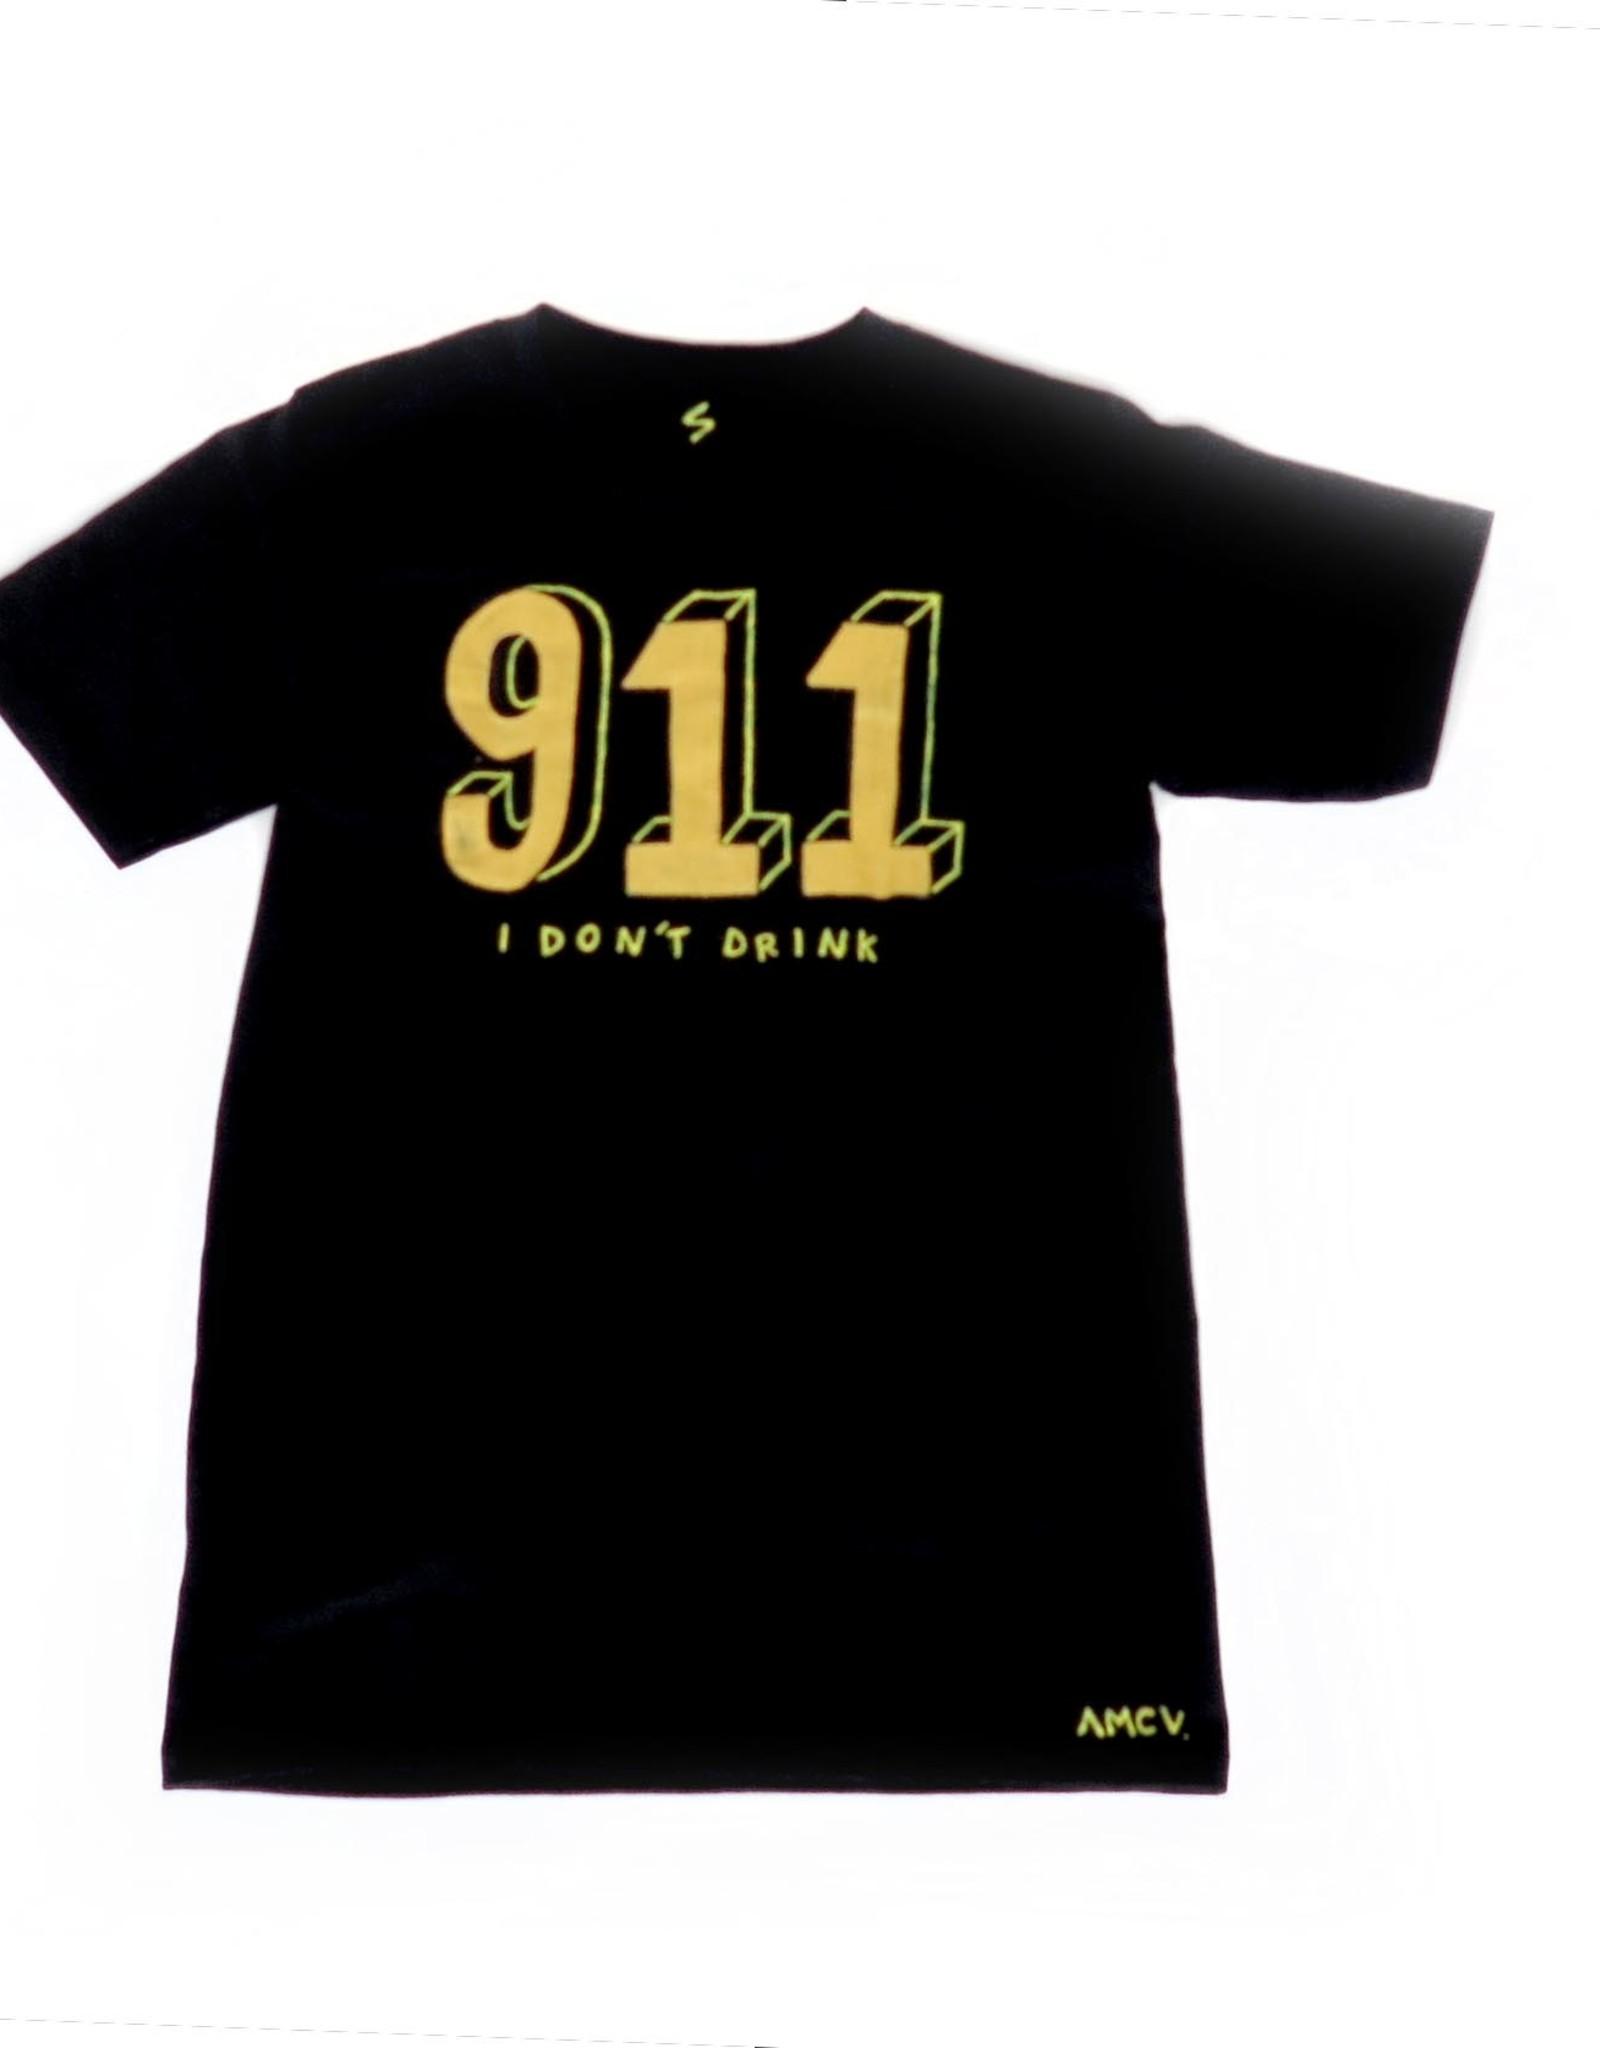 "AMCV ""911"" acrylic paint on black tshirt by AMCV"